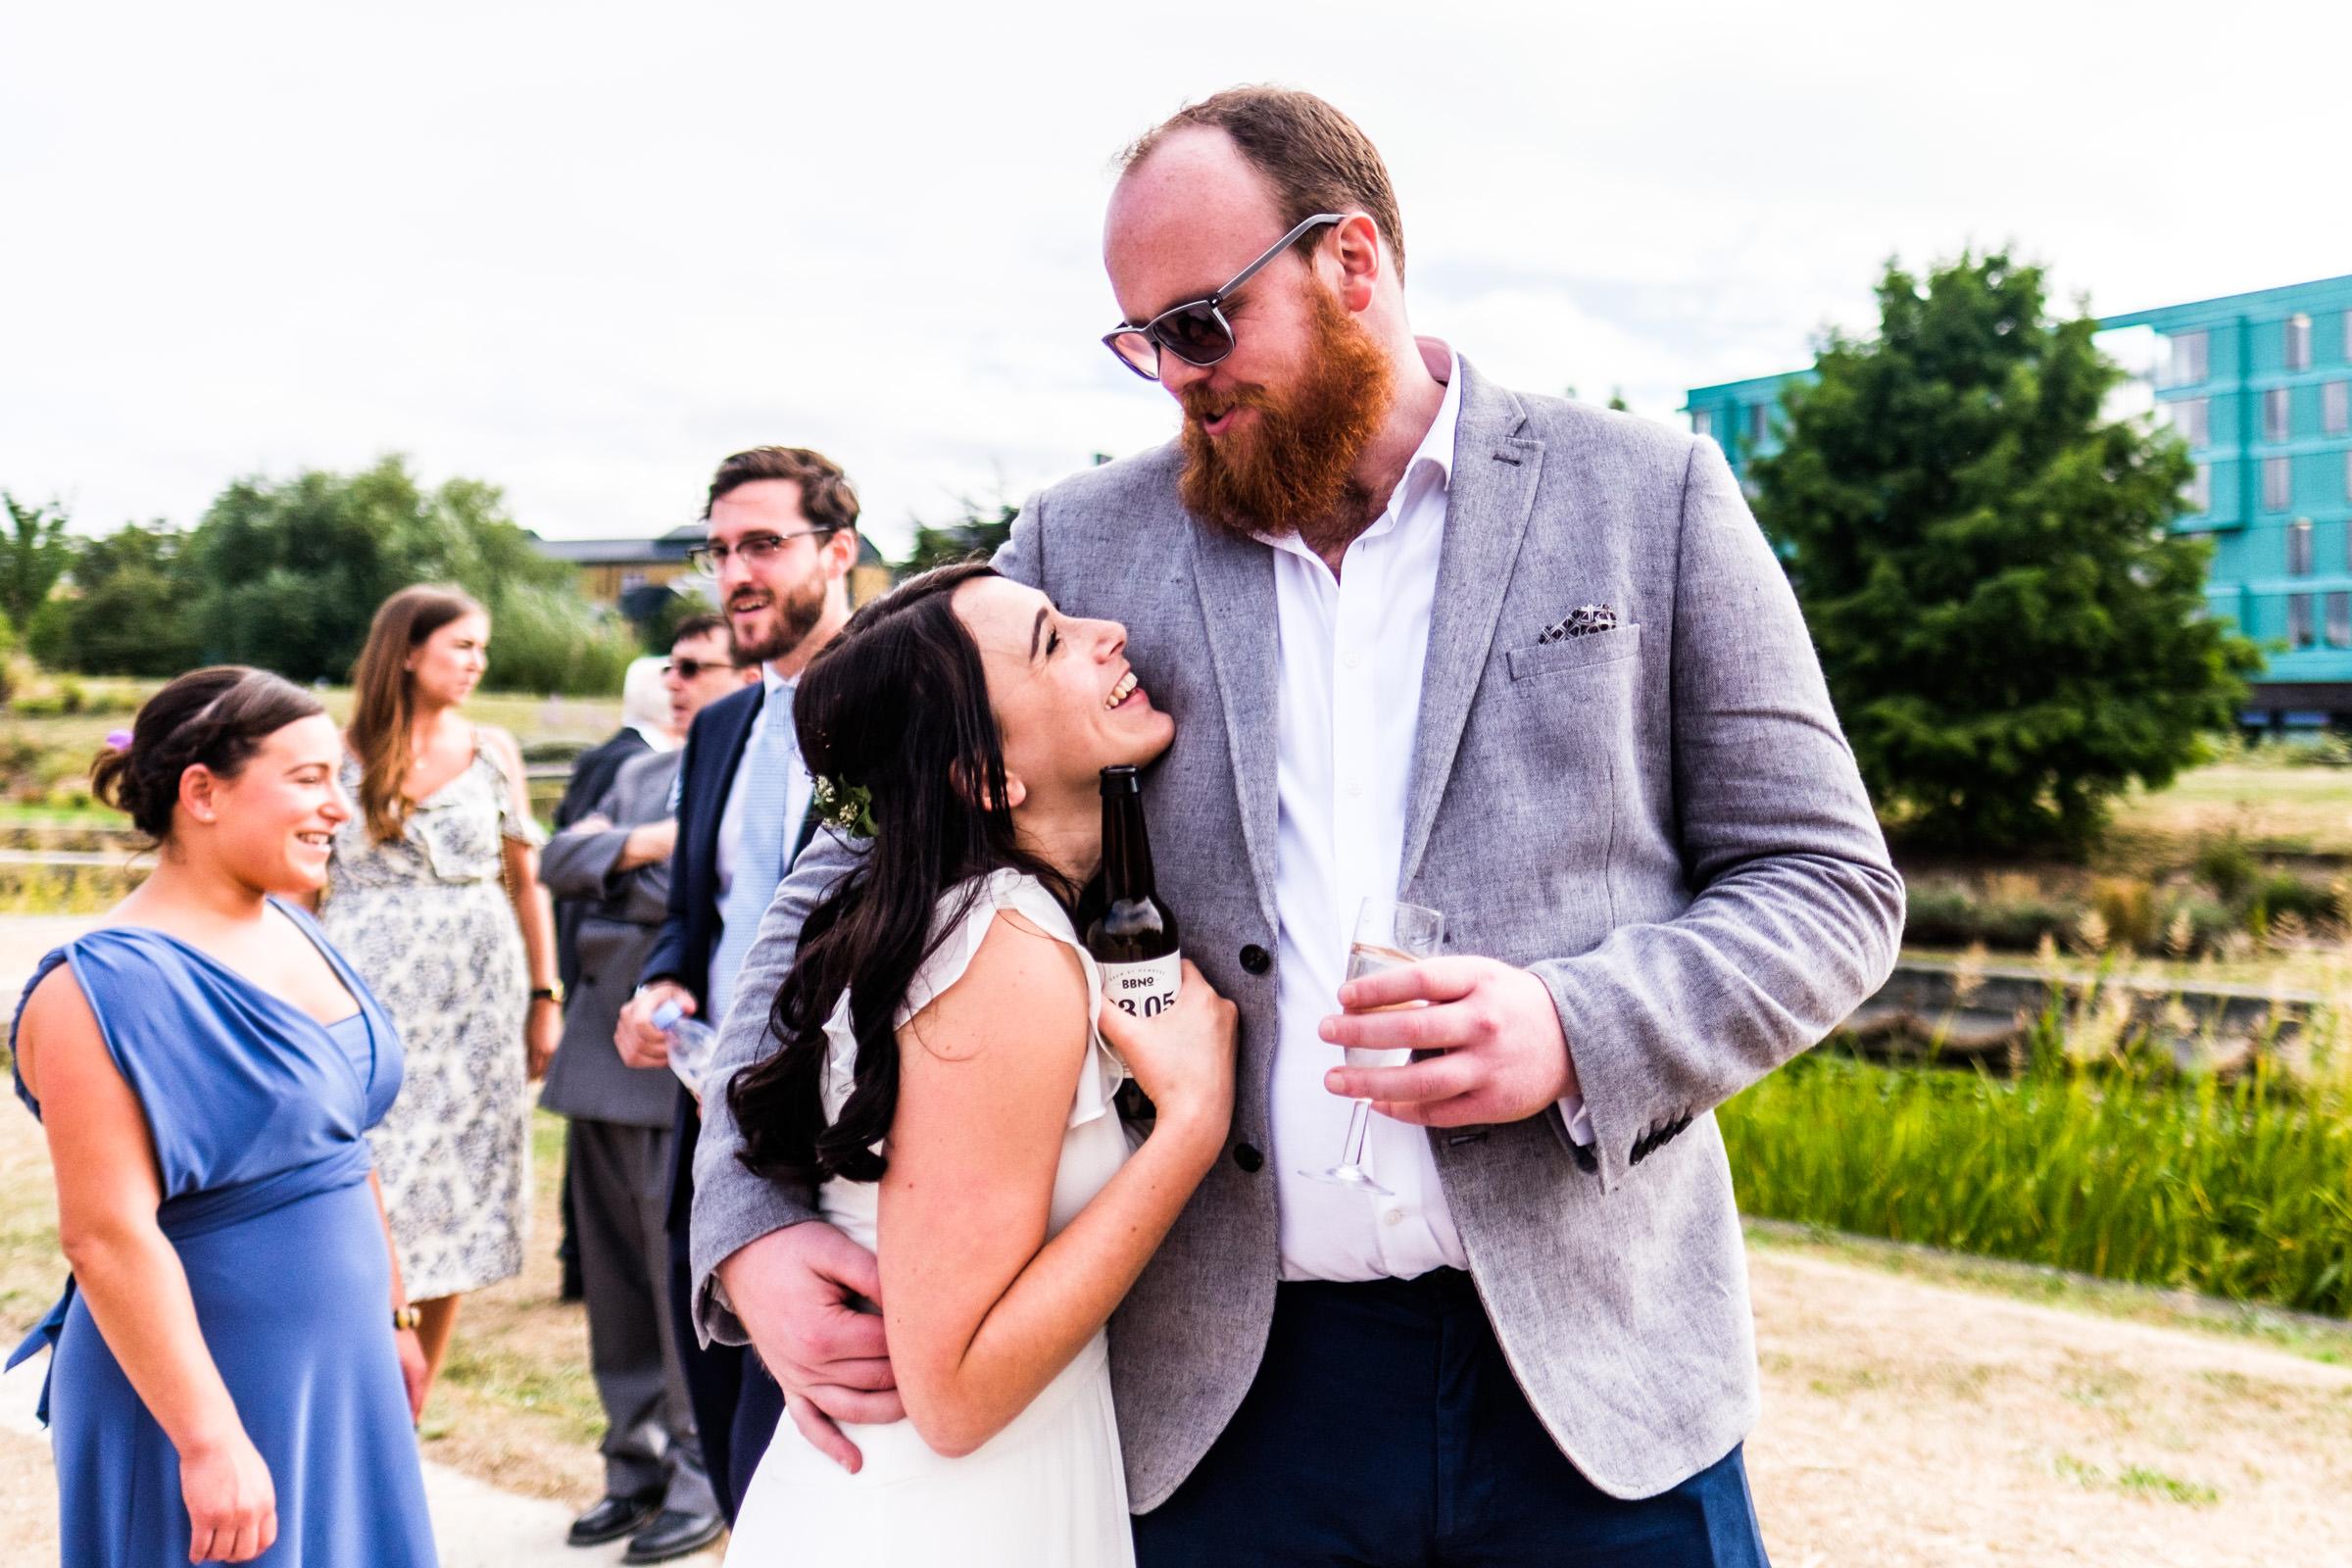 Wedding+Photography+At+The+Art+Pavilion+Mile+End+009.jpg